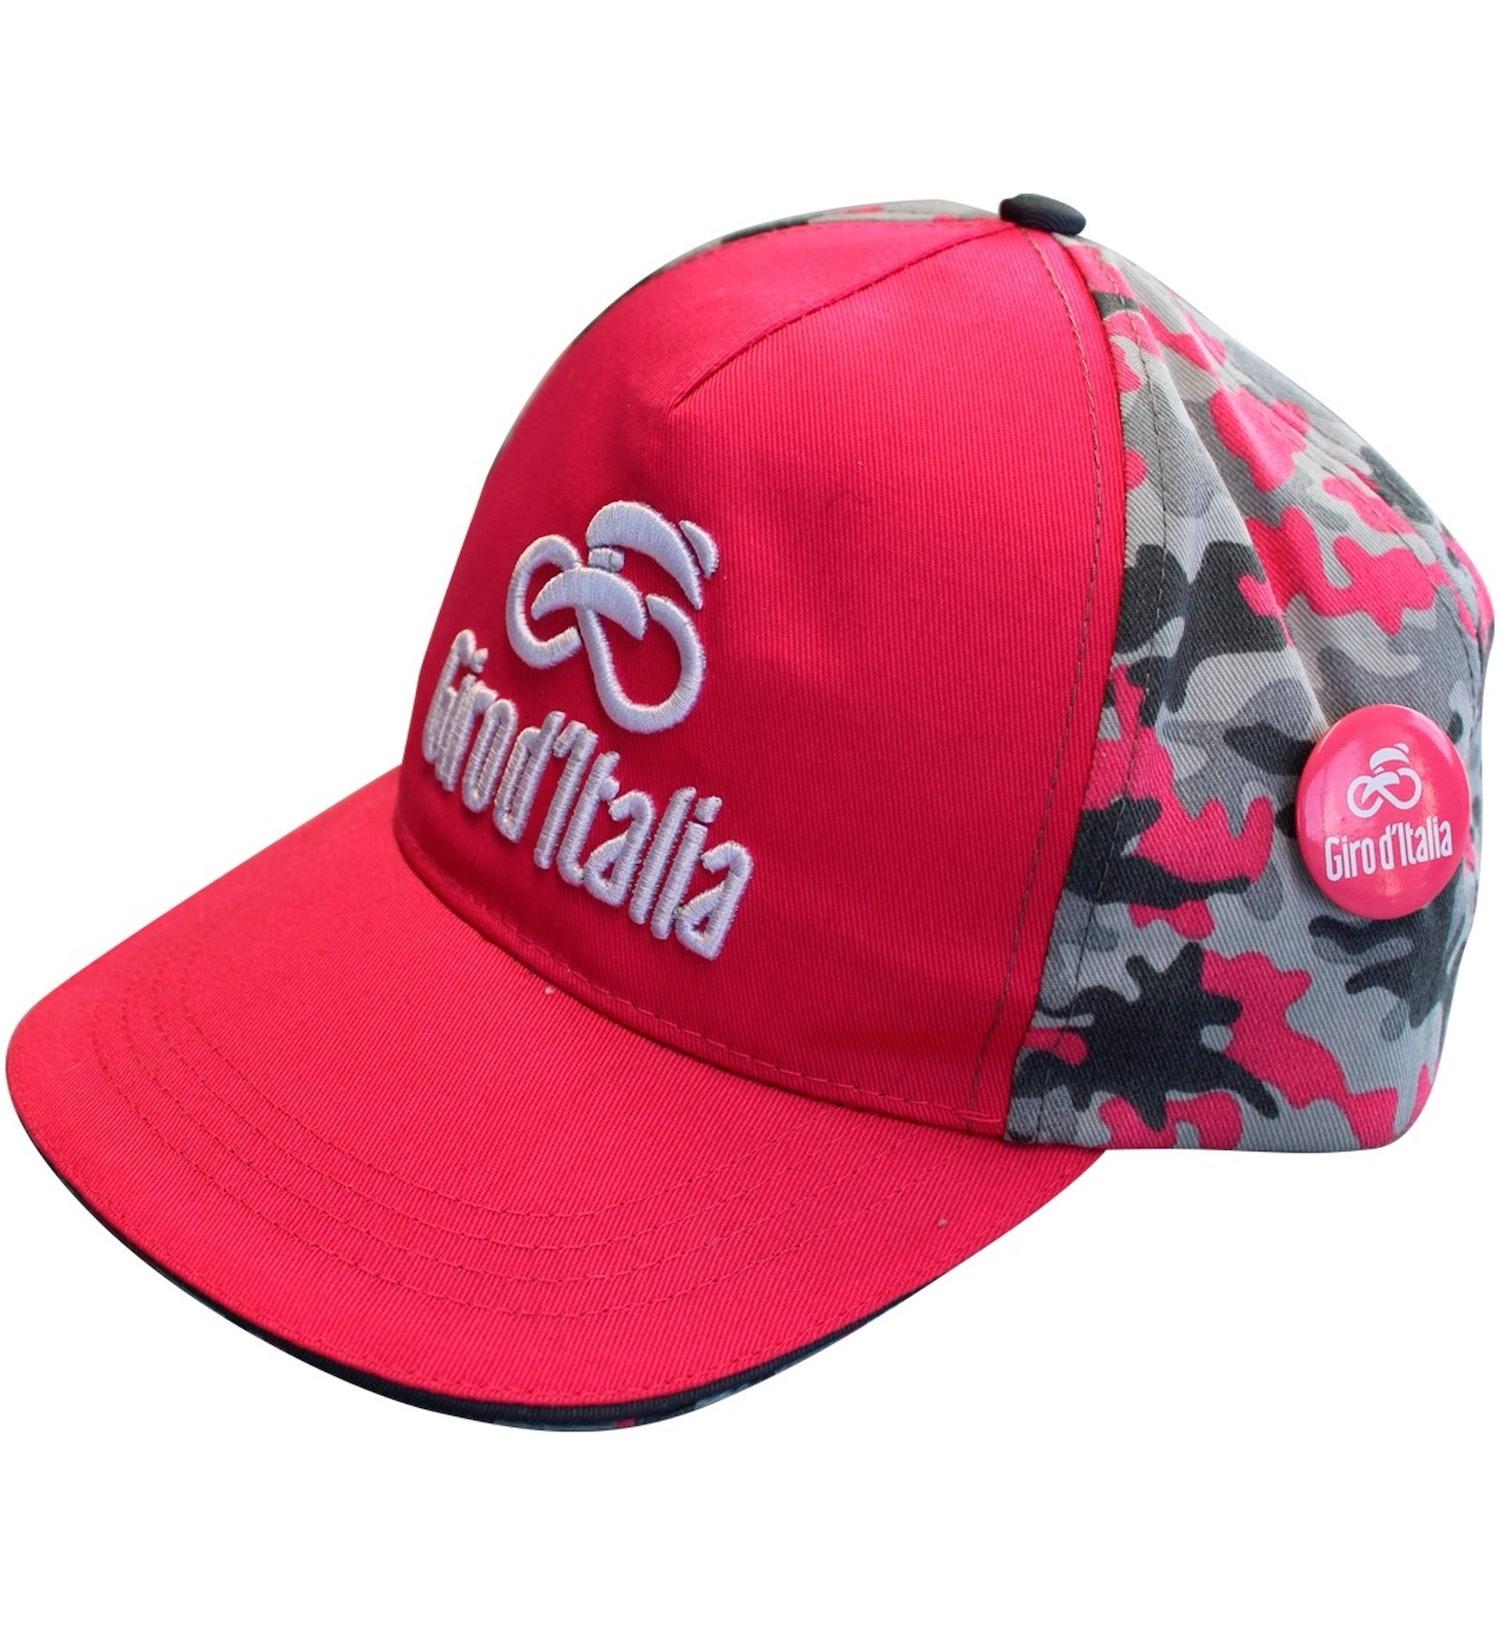 Giro d'Italia Giro d'Italia 2019 - cappellino bici